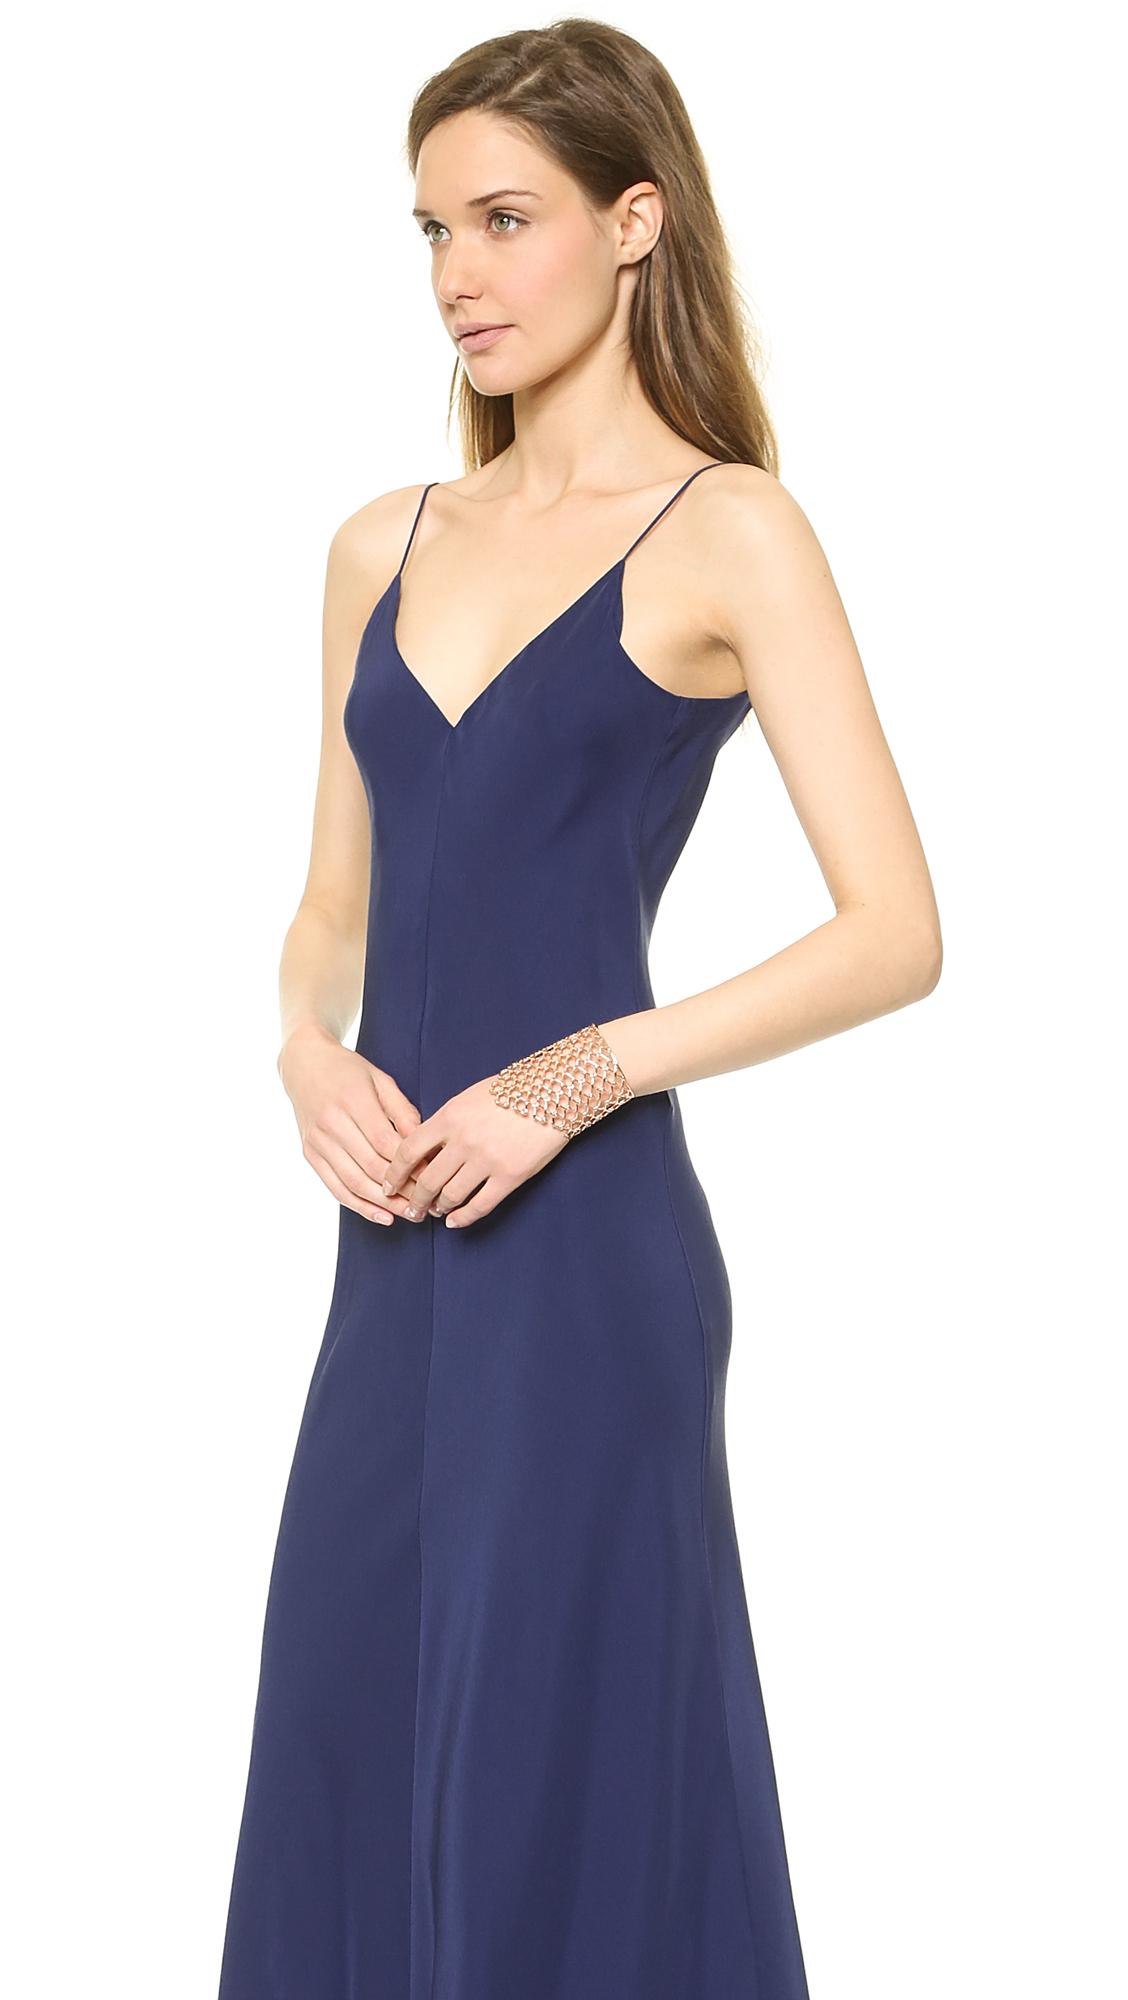 Lyst - Amanda Uprichard Bias Maxi Dress in Blue